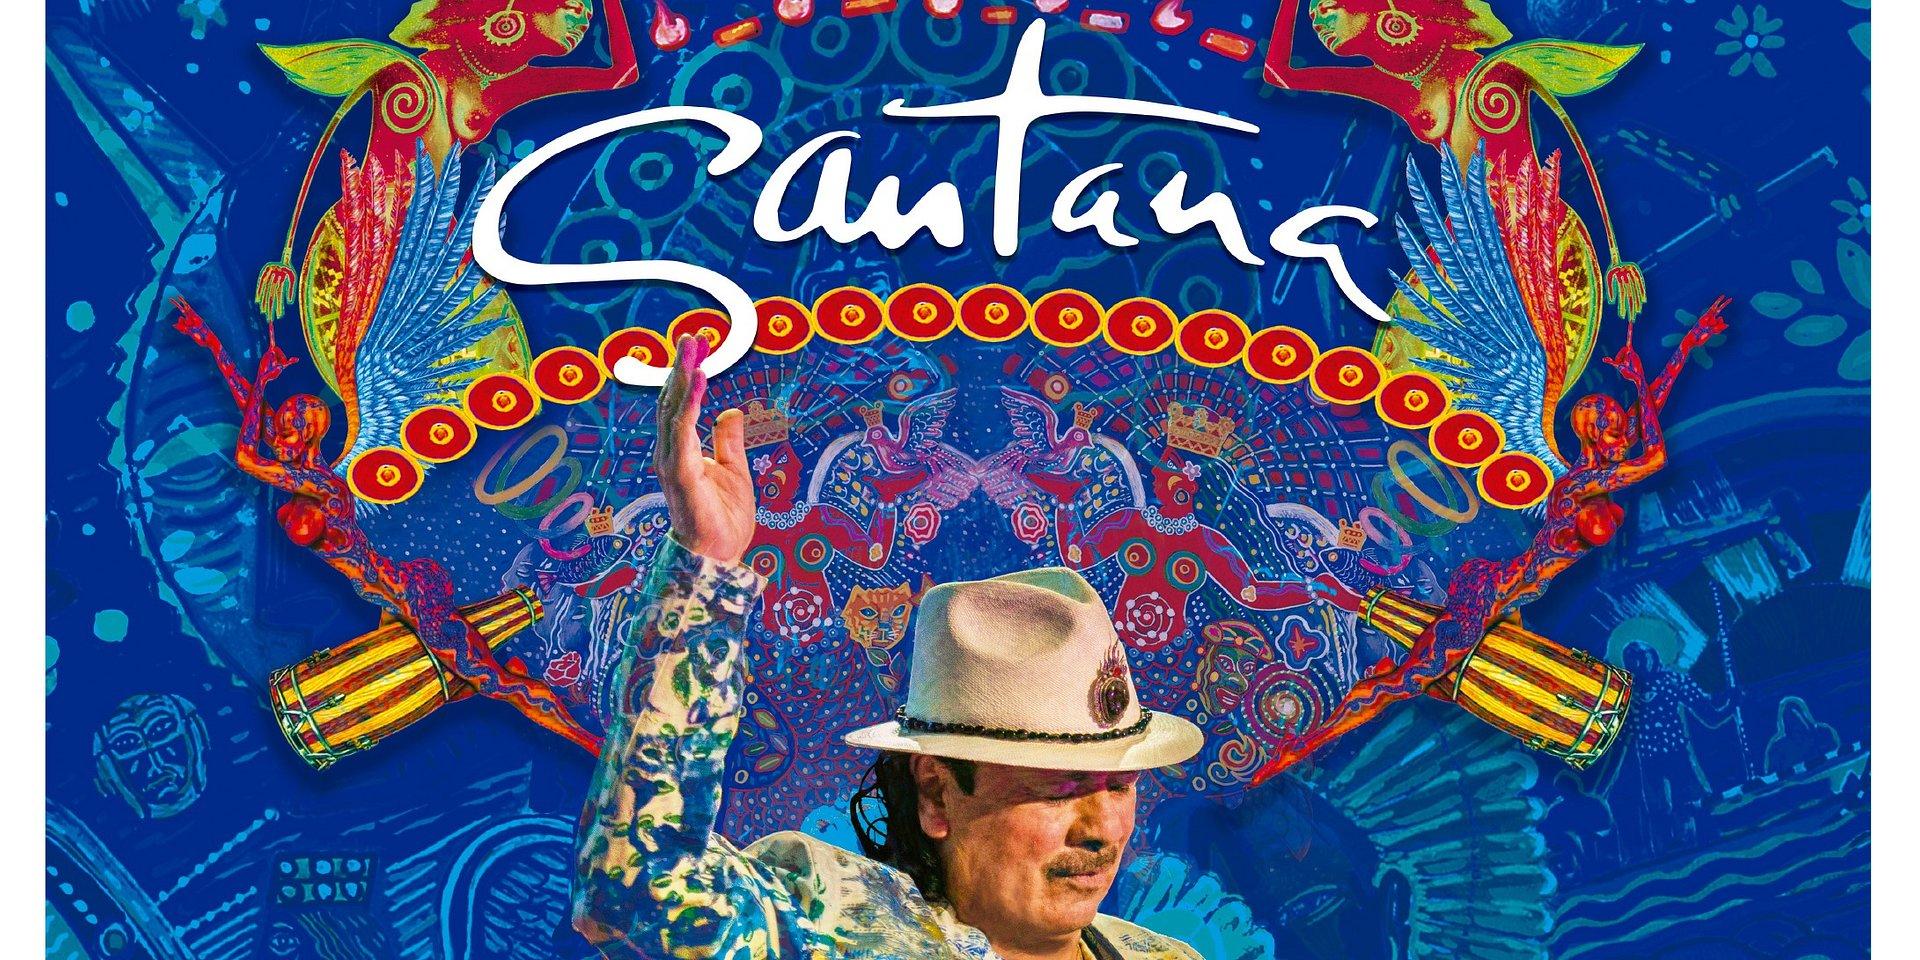 Carlos Santana traerá su Global Consciousness a México en abril de 2019